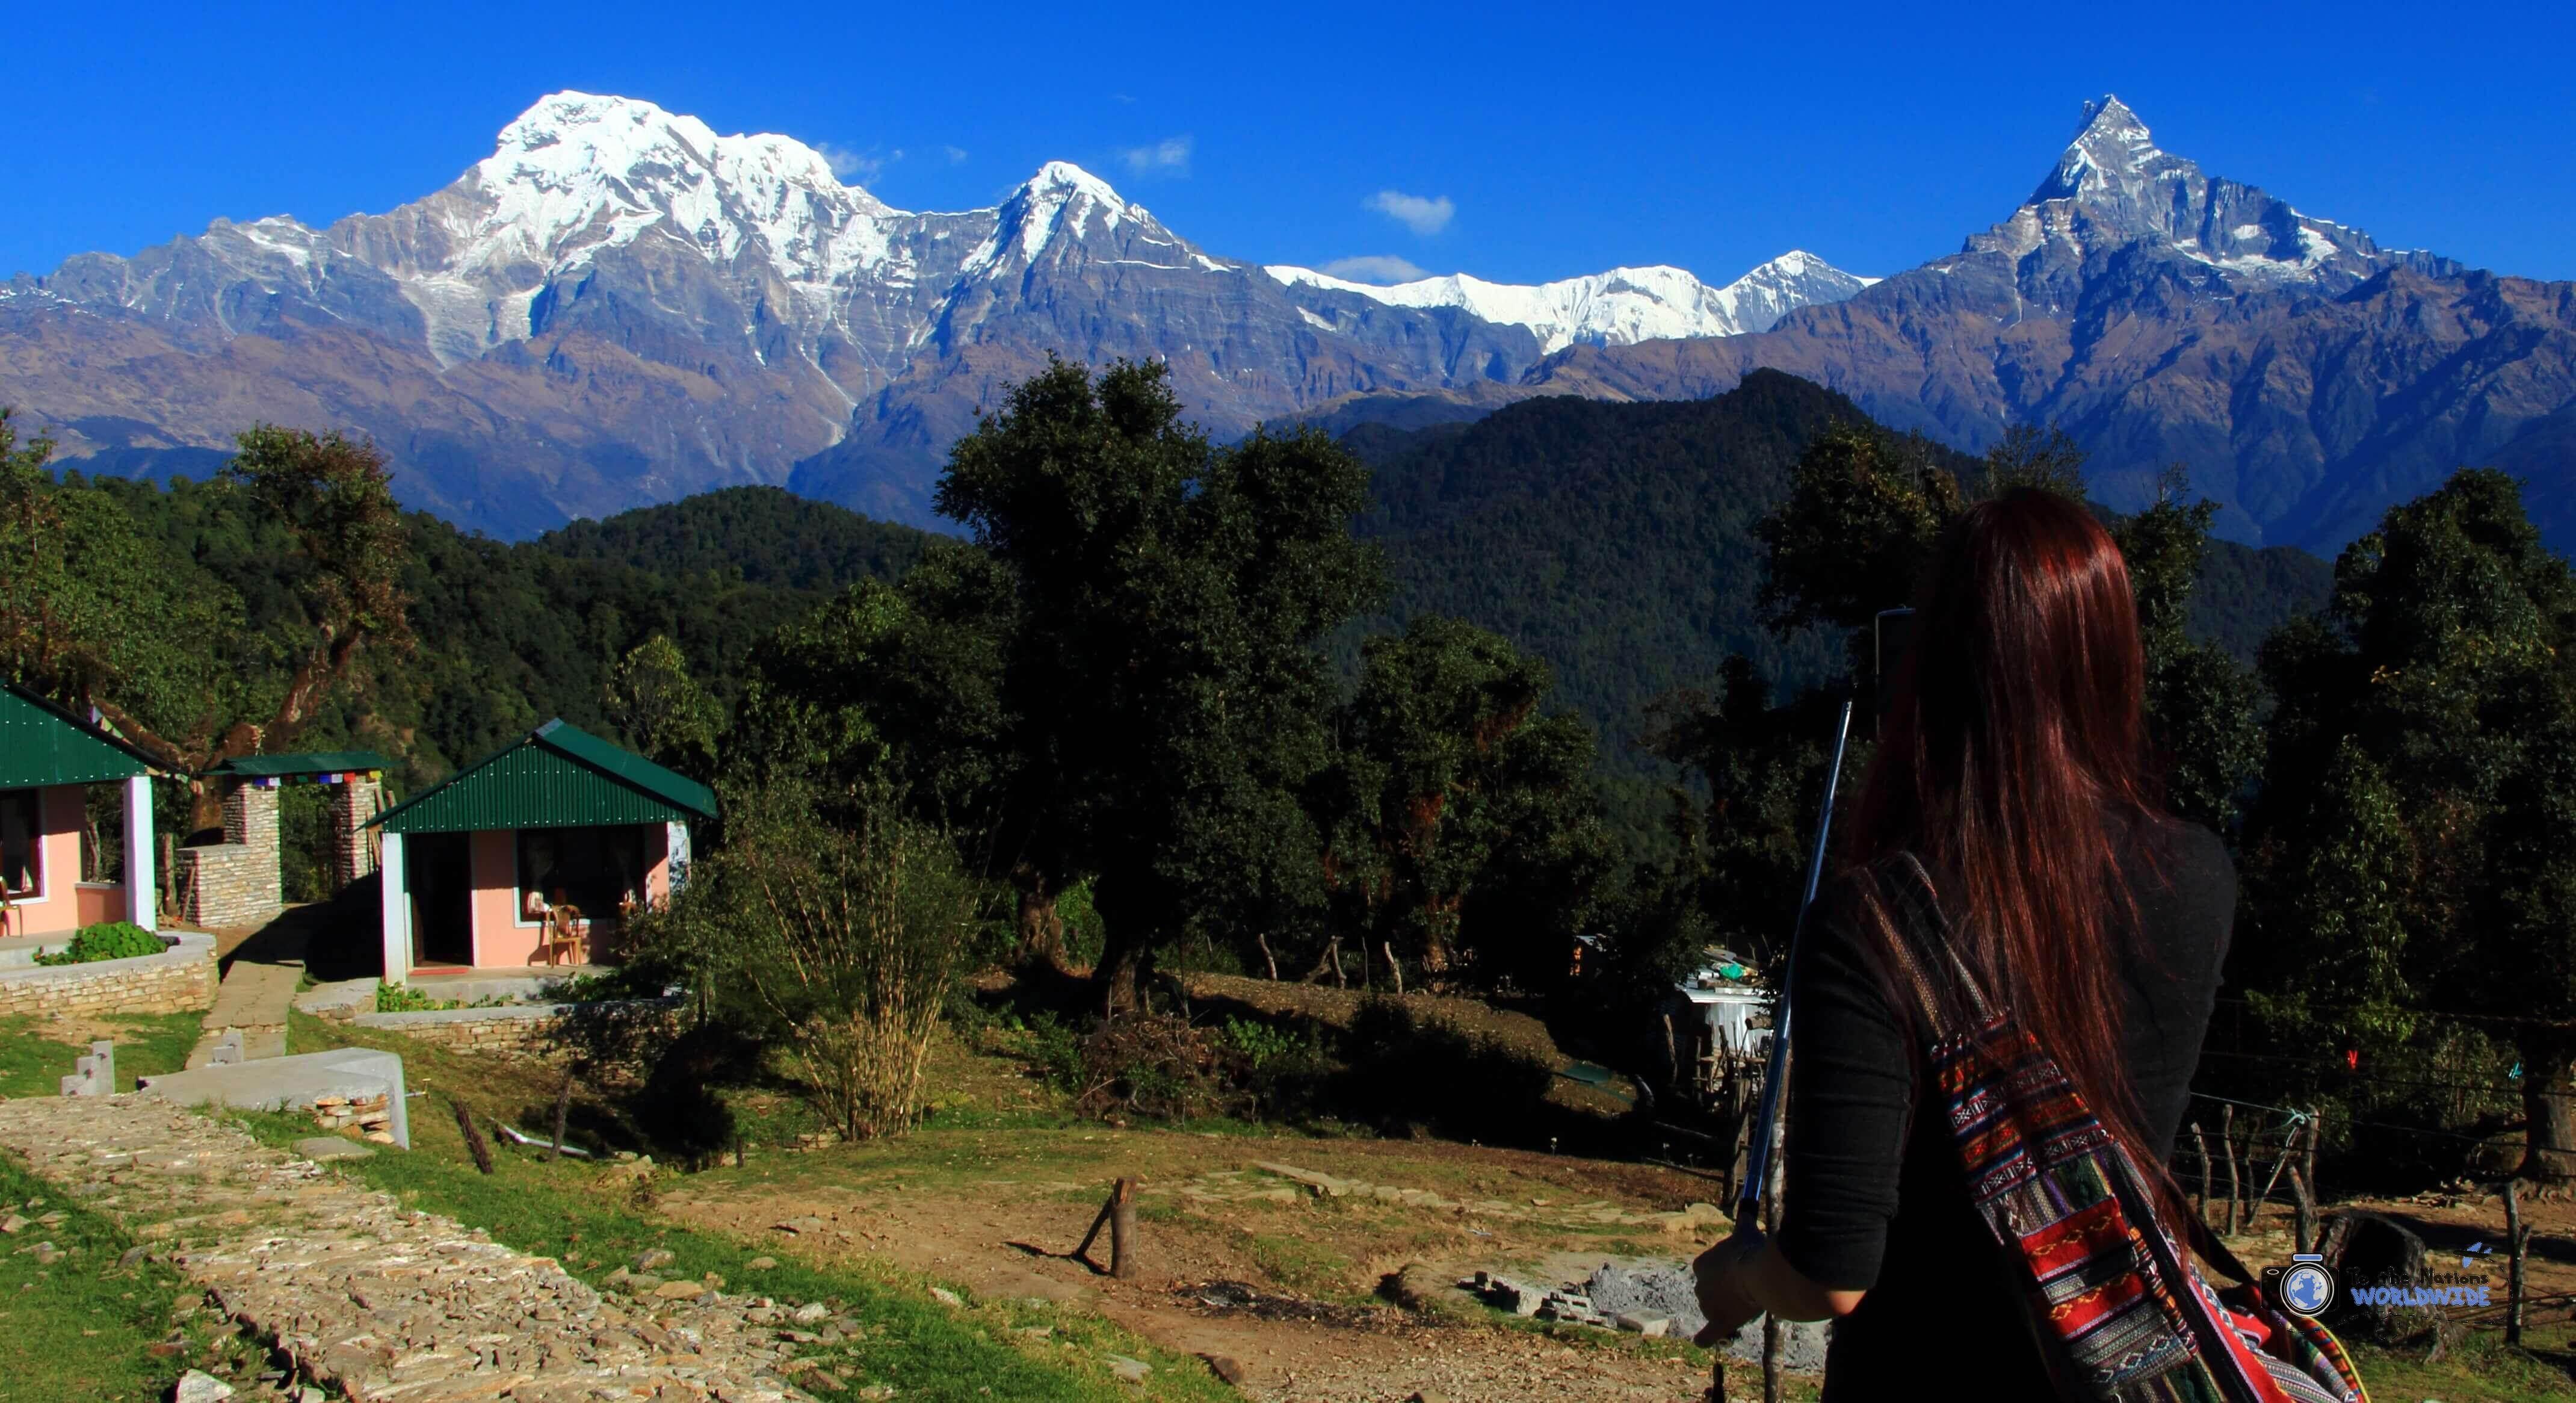 One Day Trek in Pokhara, Nepal